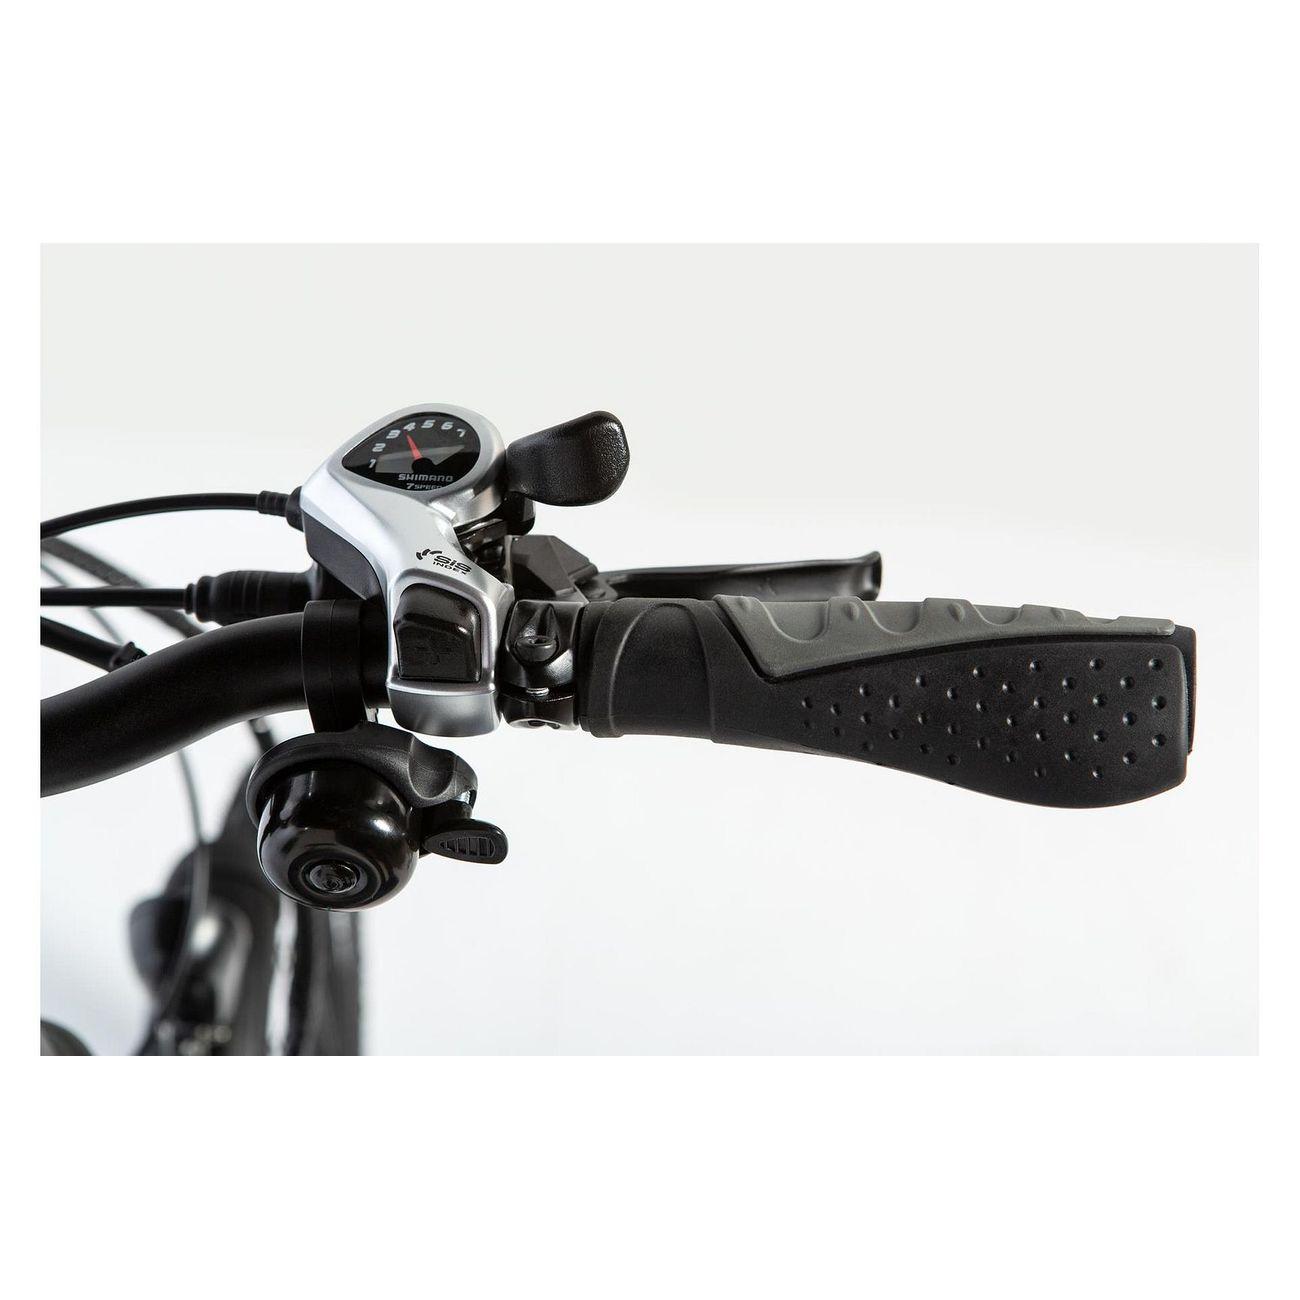 MOMABIKES Vélo électrique de ville pliant, E20 Pro, Aluminium, SHIMANO 7V